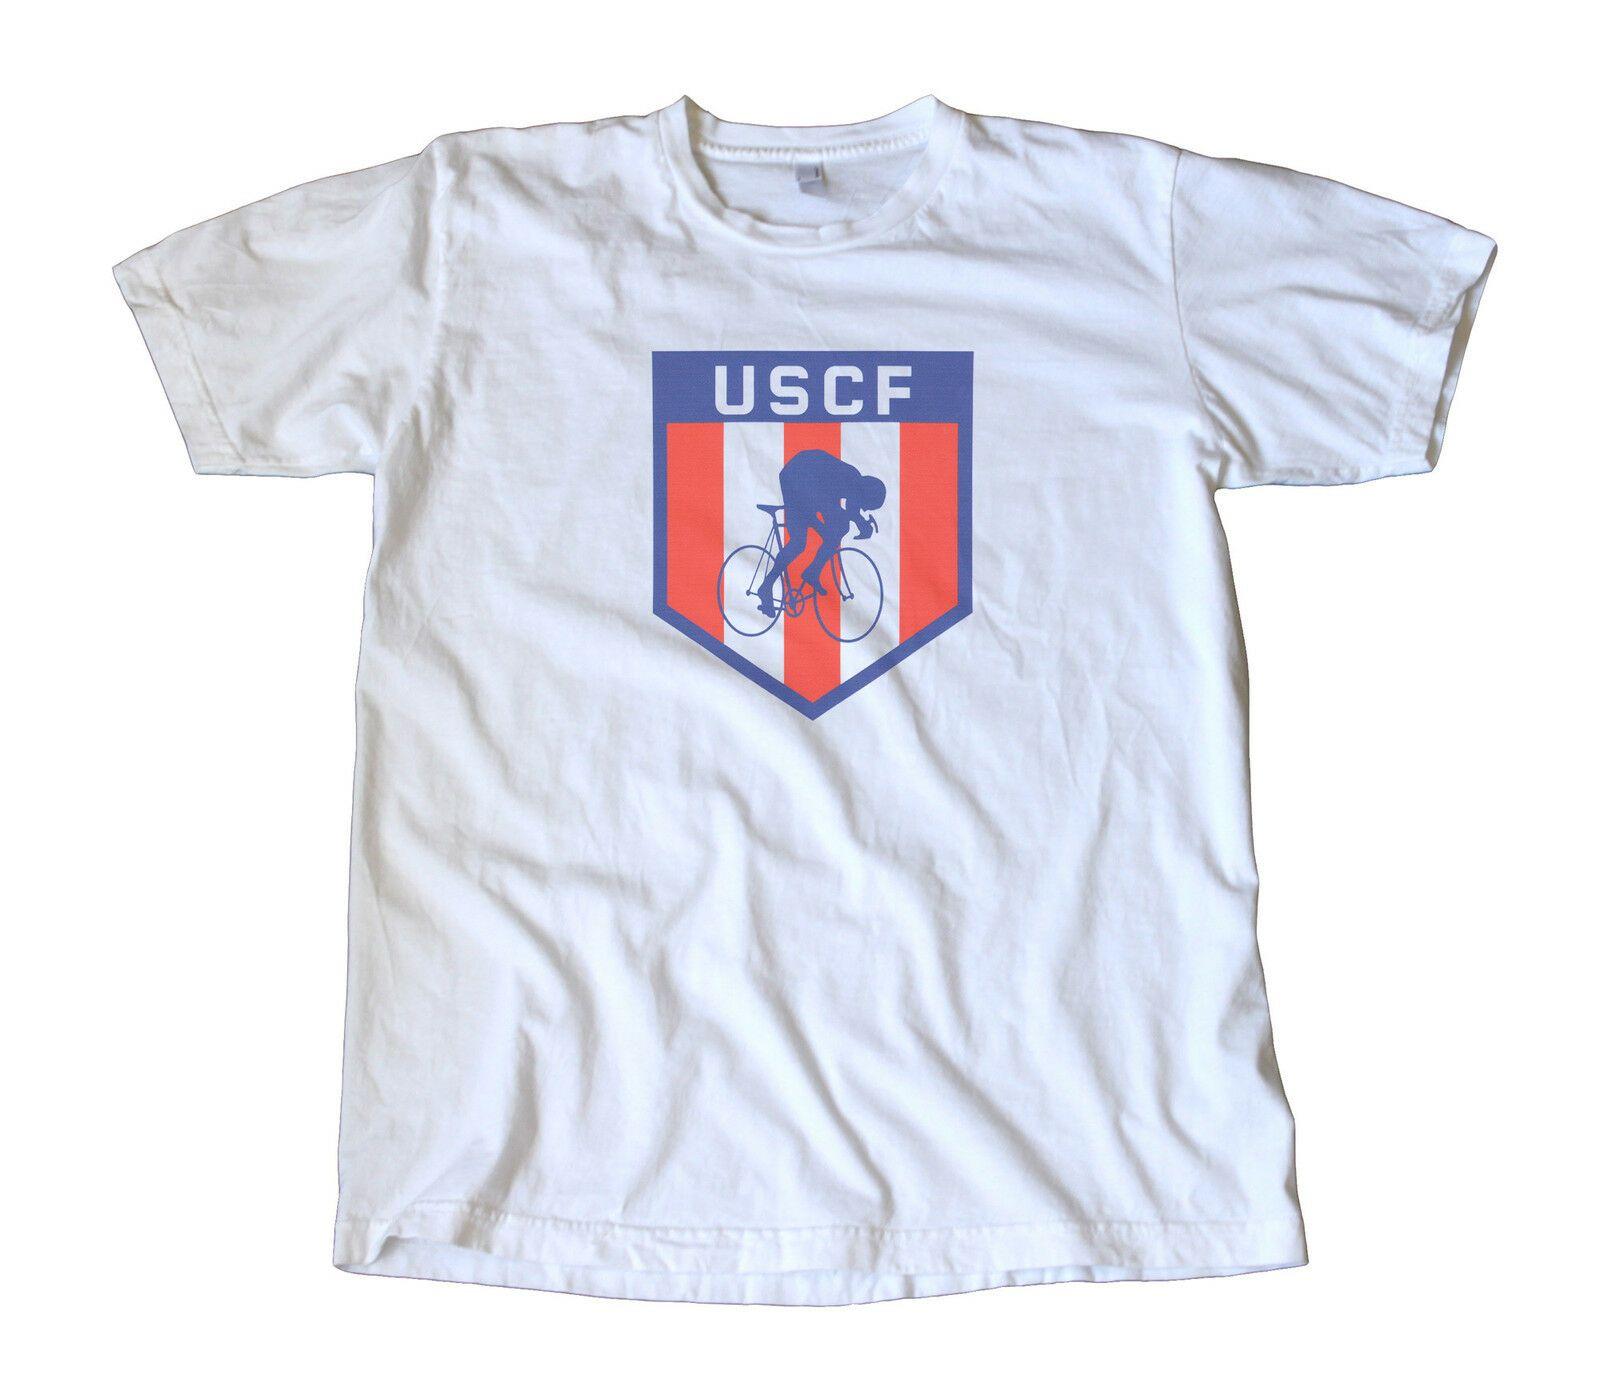 Klassische USA Cycling Federation Logo T-Shirt - USCF, Fixie, Racing